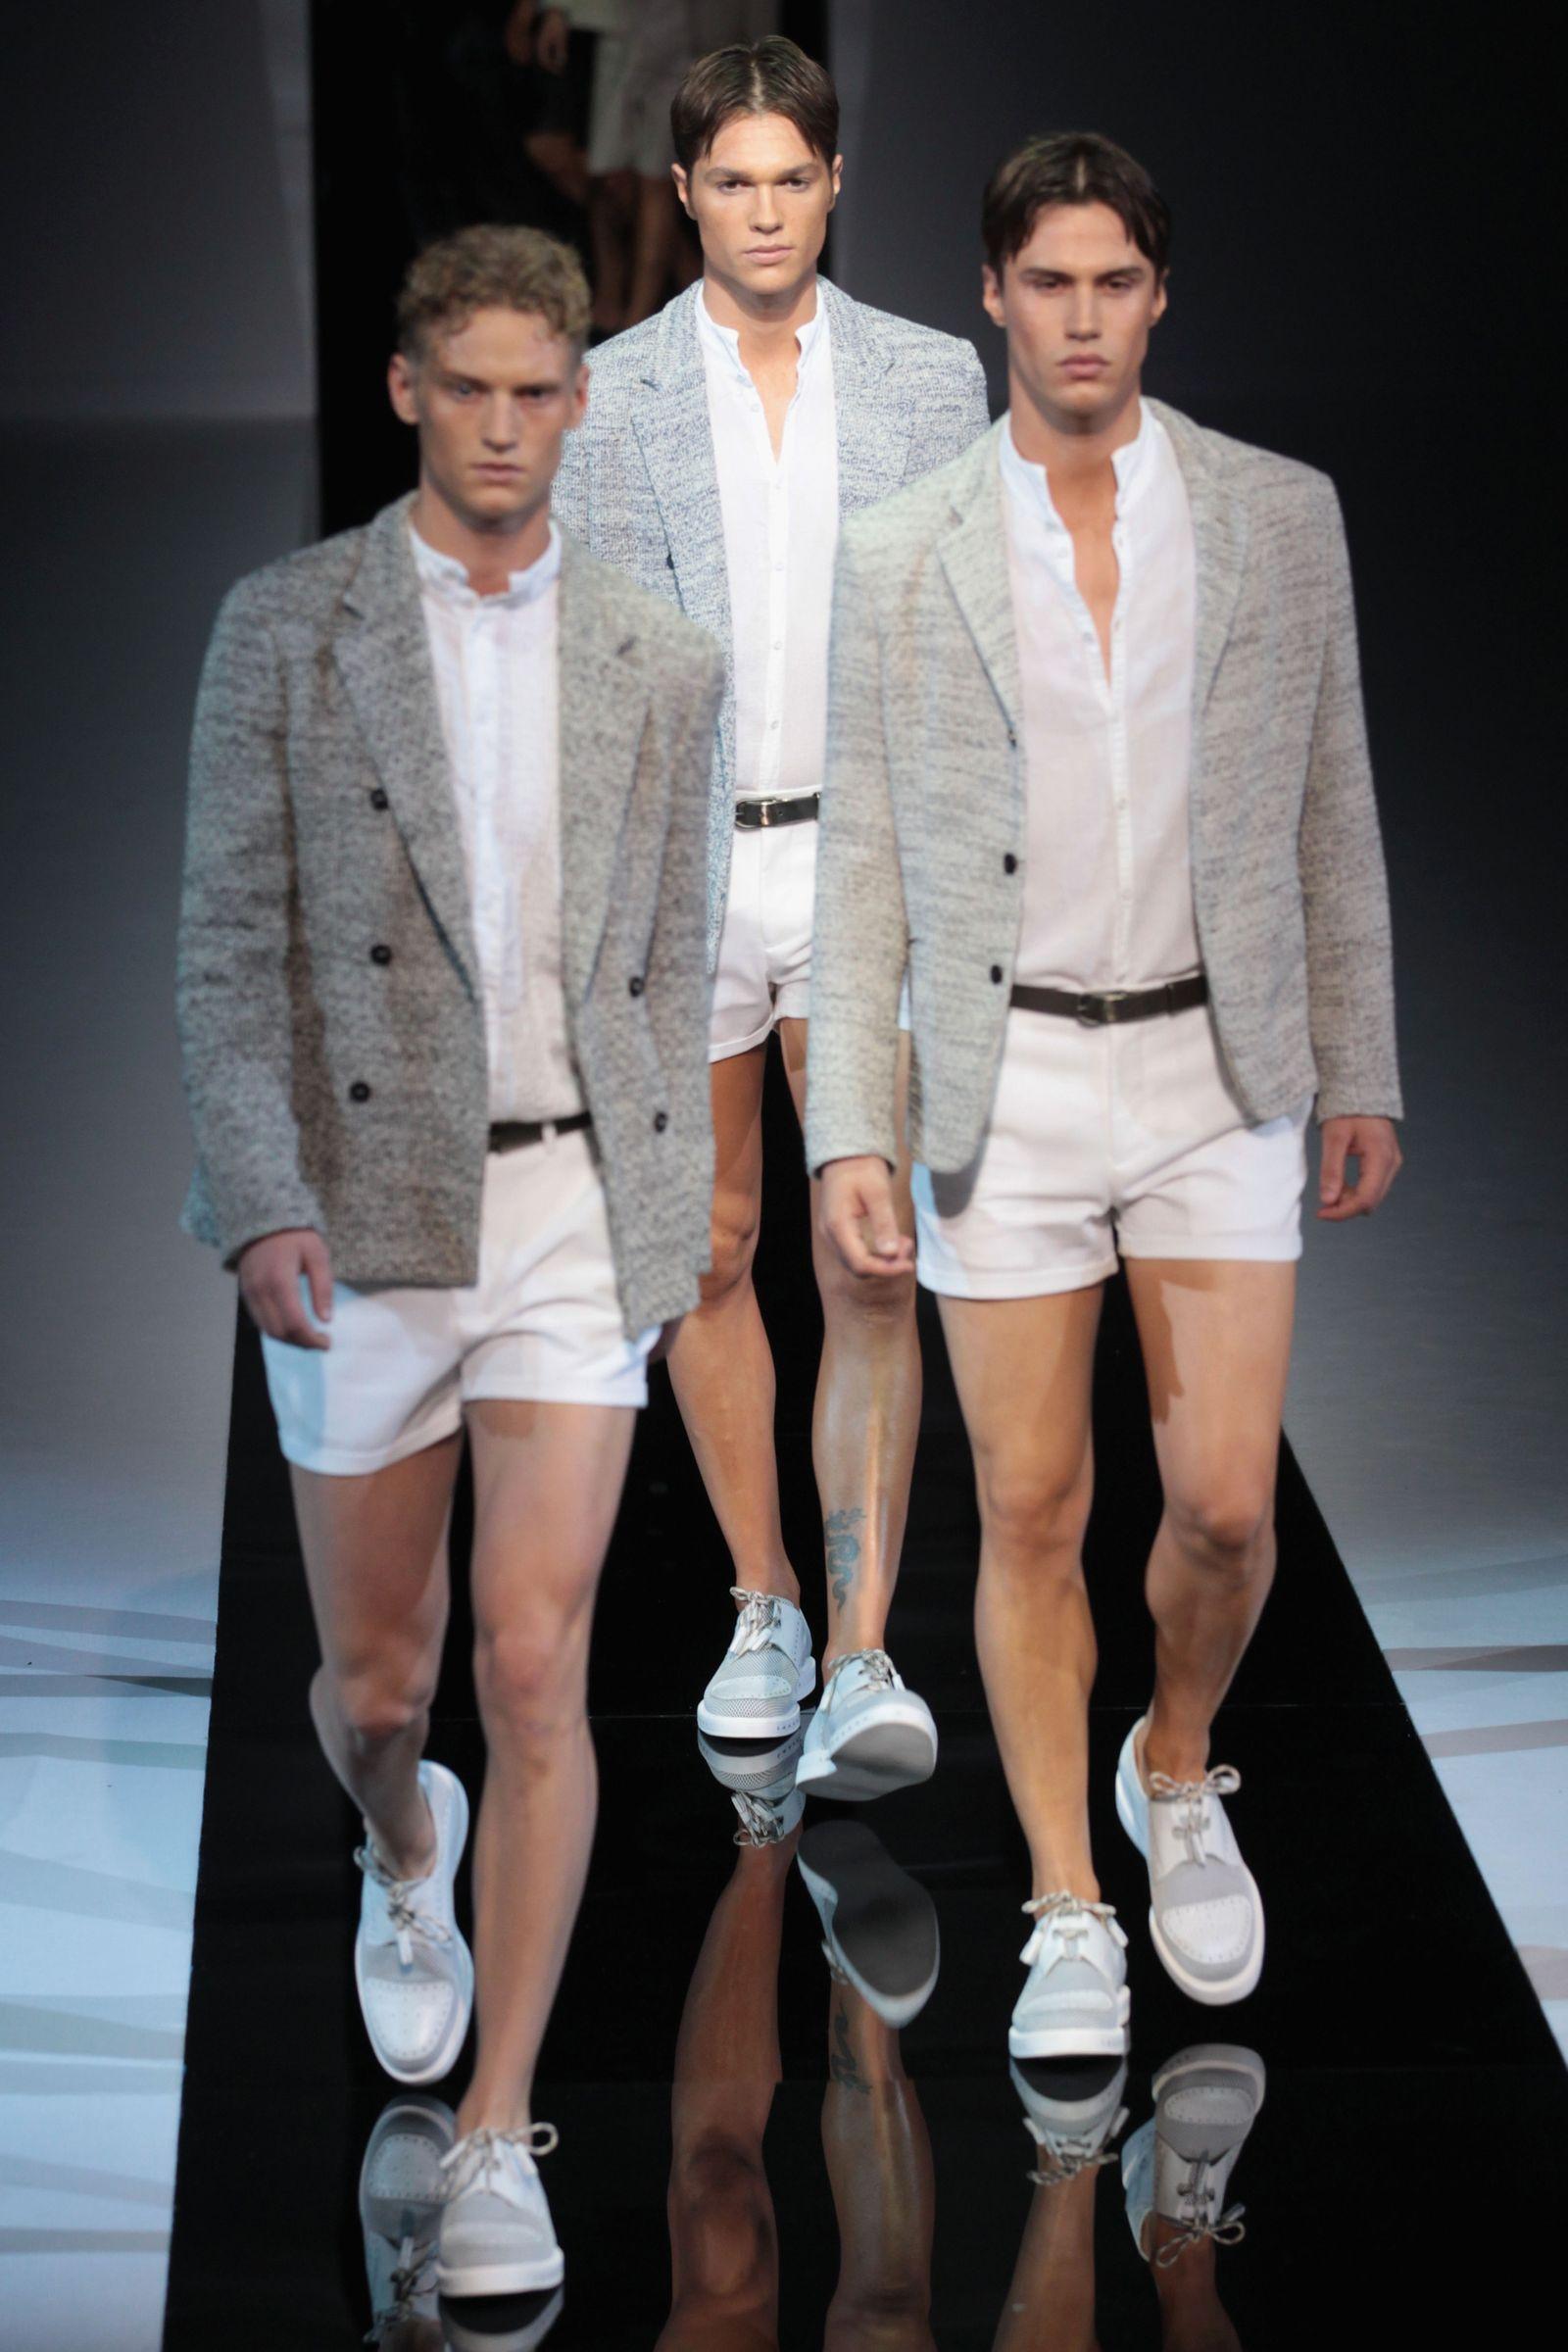 Milano Moda Uomo 2012 / Emporio Armani